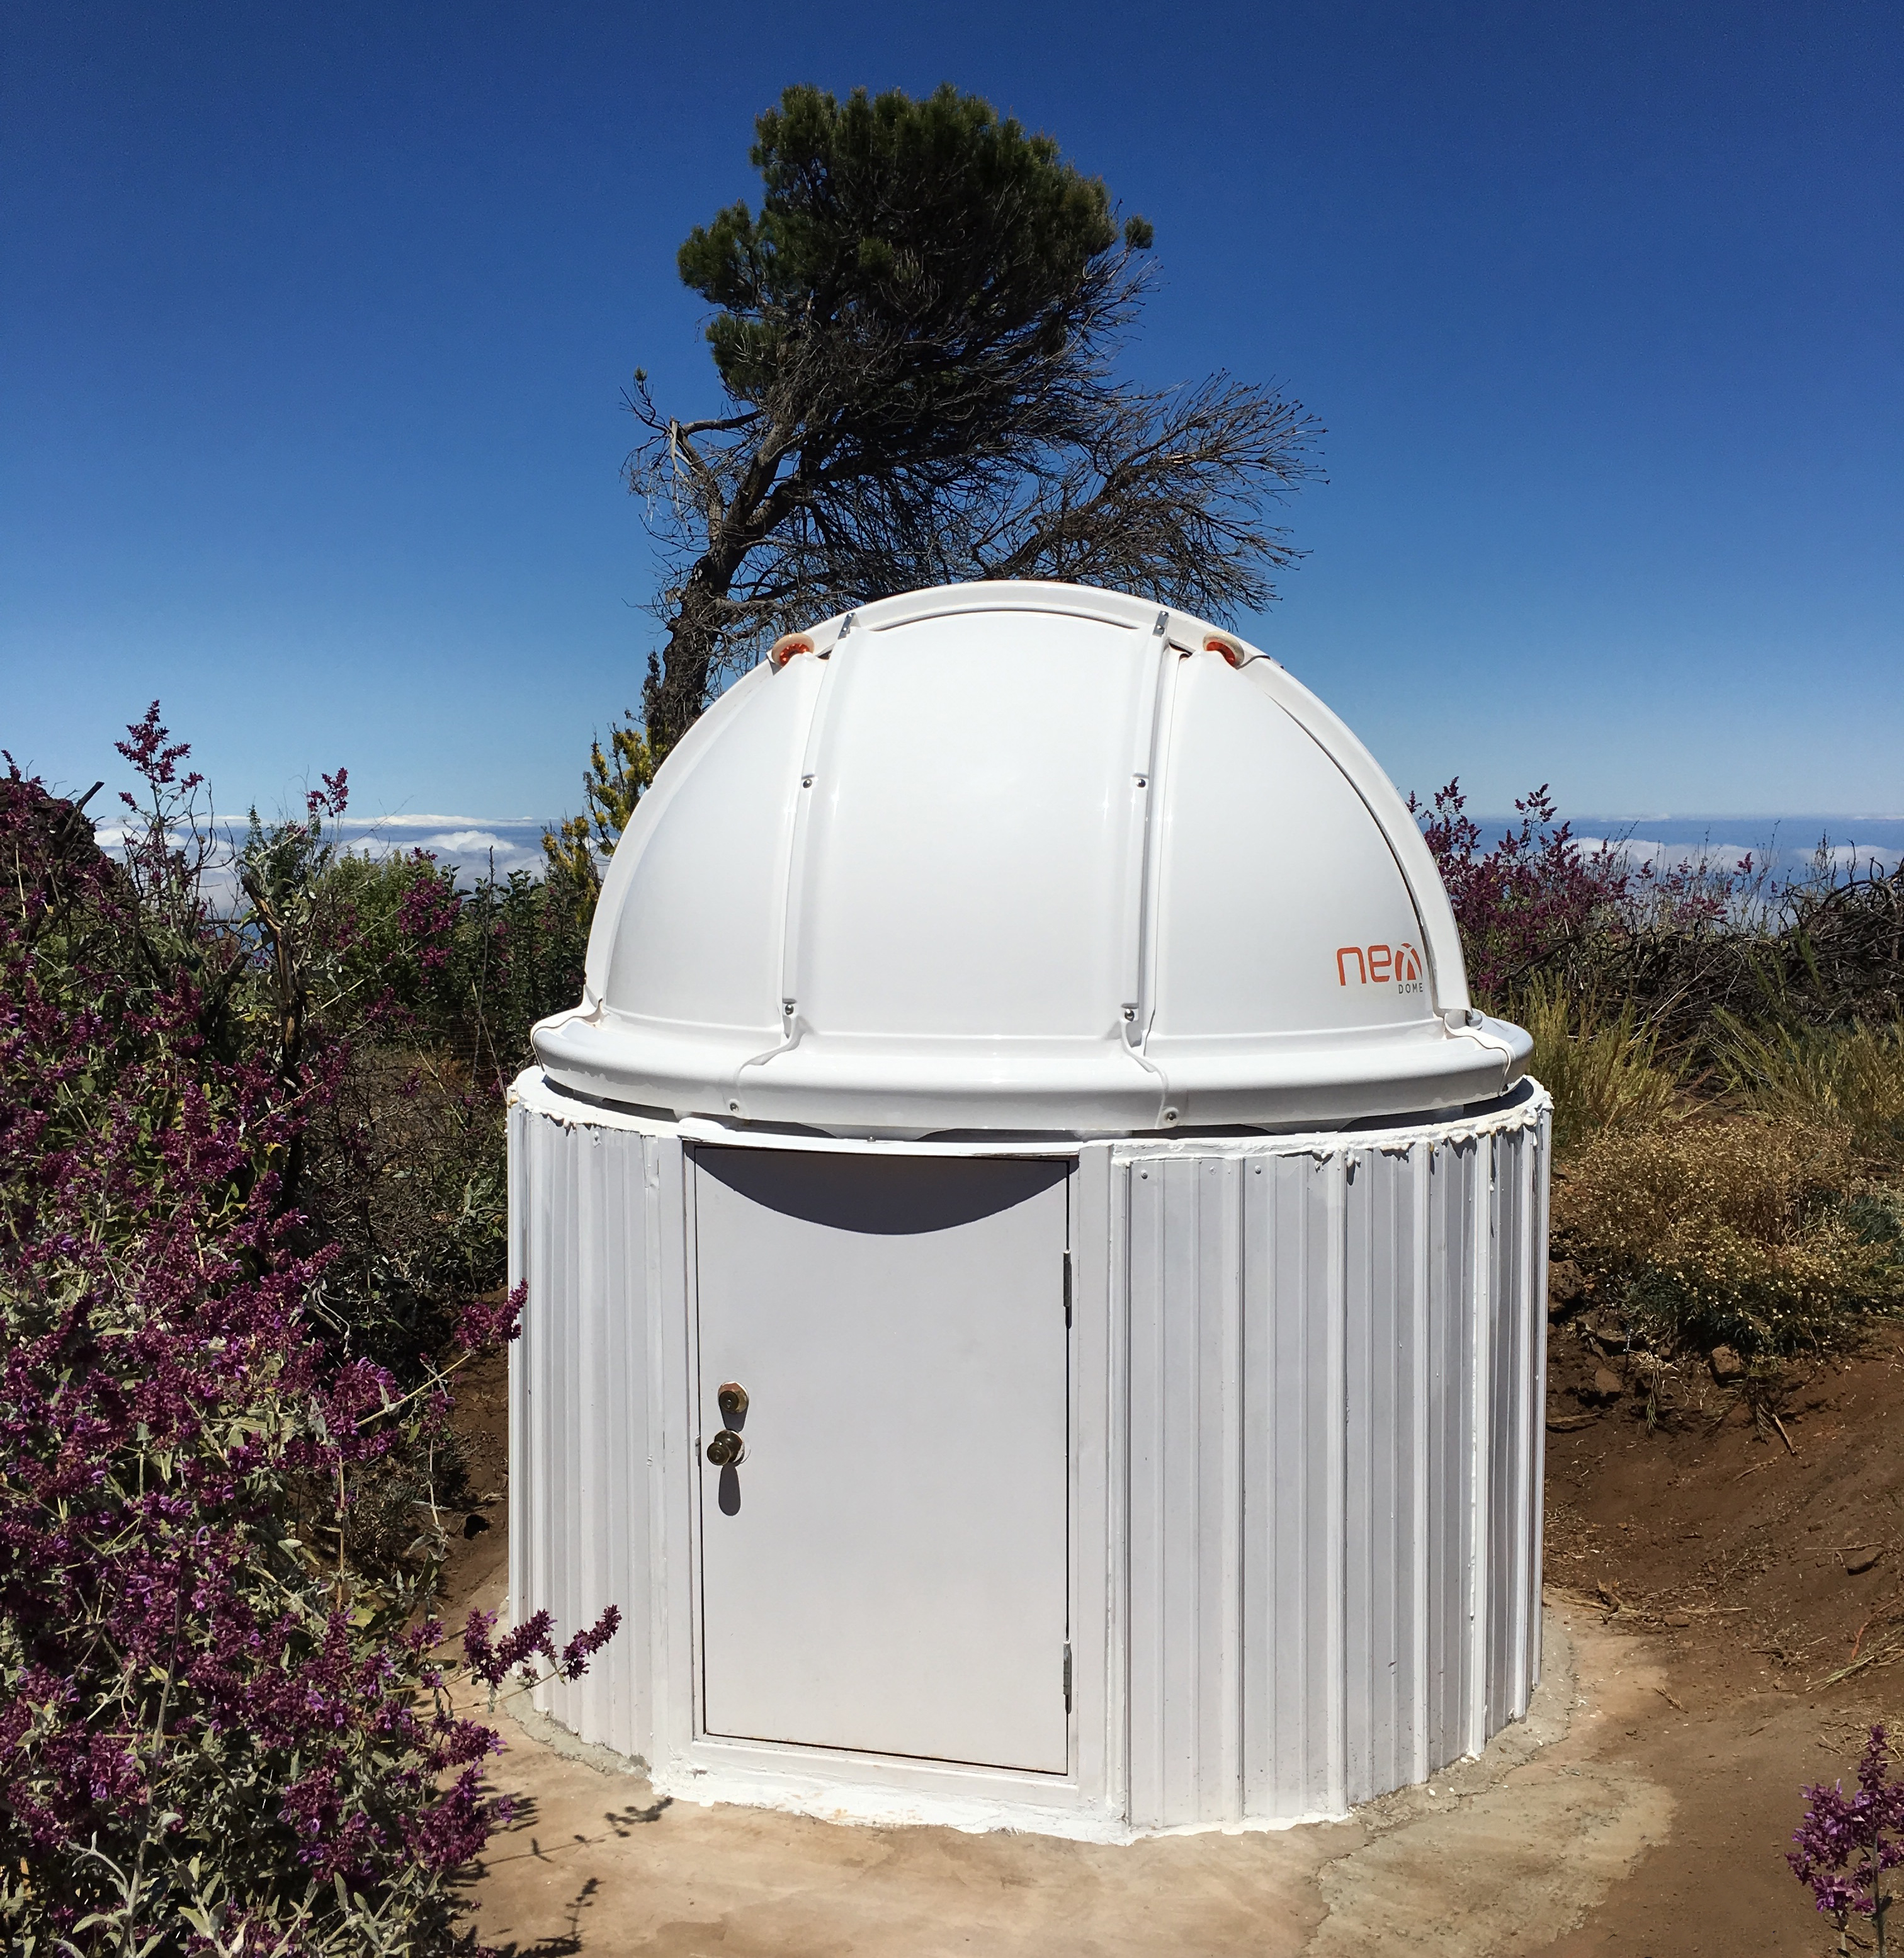 Gran Canaria Observatory